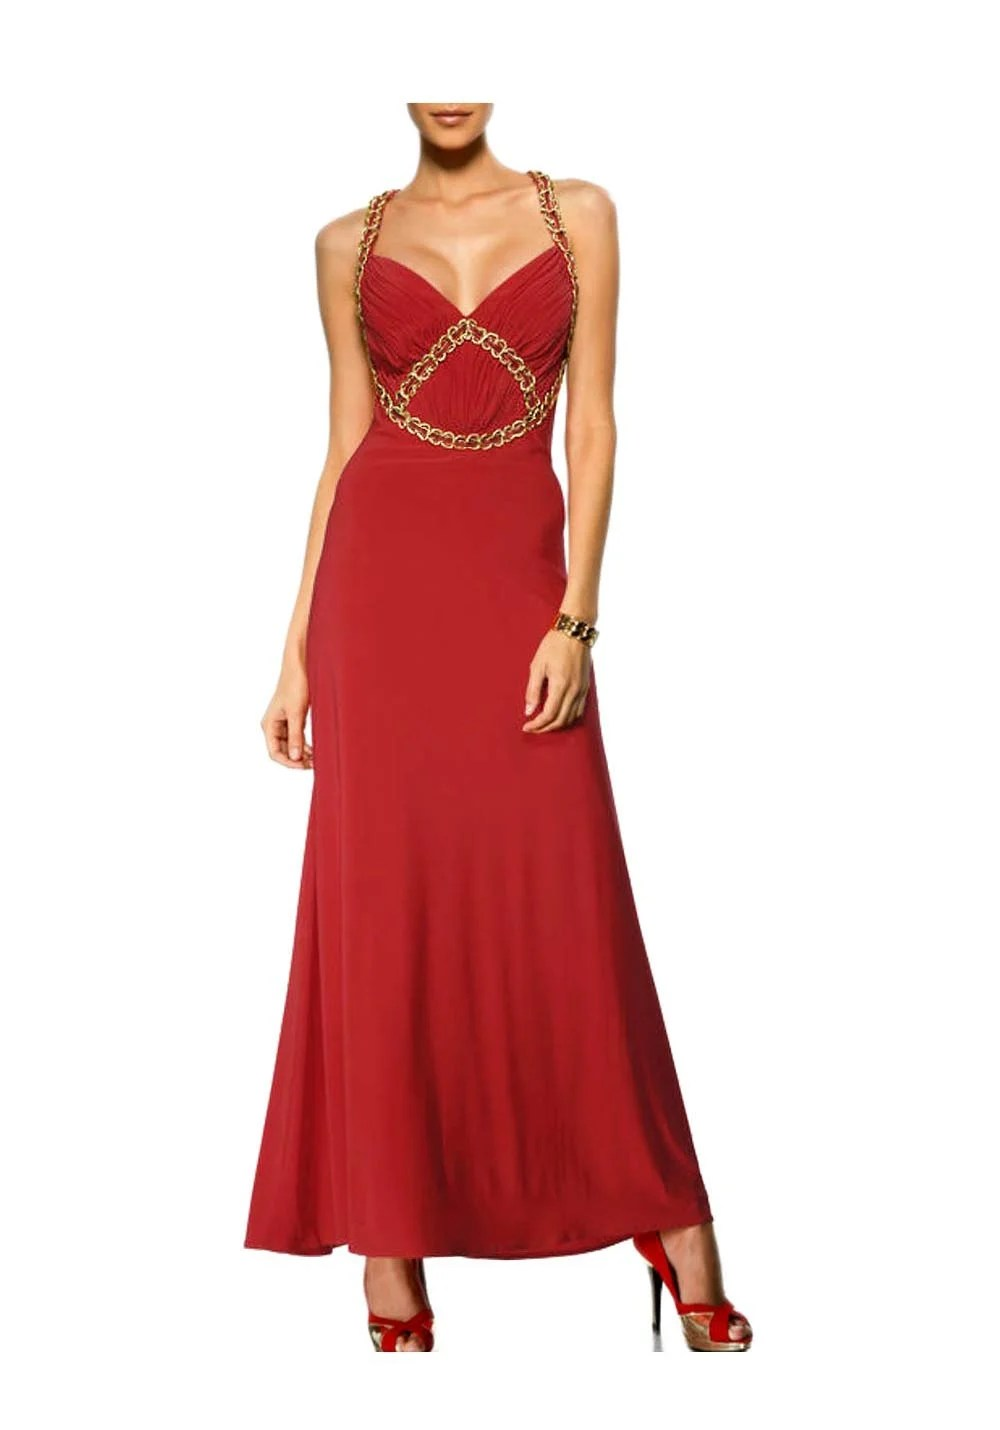 Festmoden HEINE Damen Designer-Abendkleid Rot-Gold 082.899 Missforty